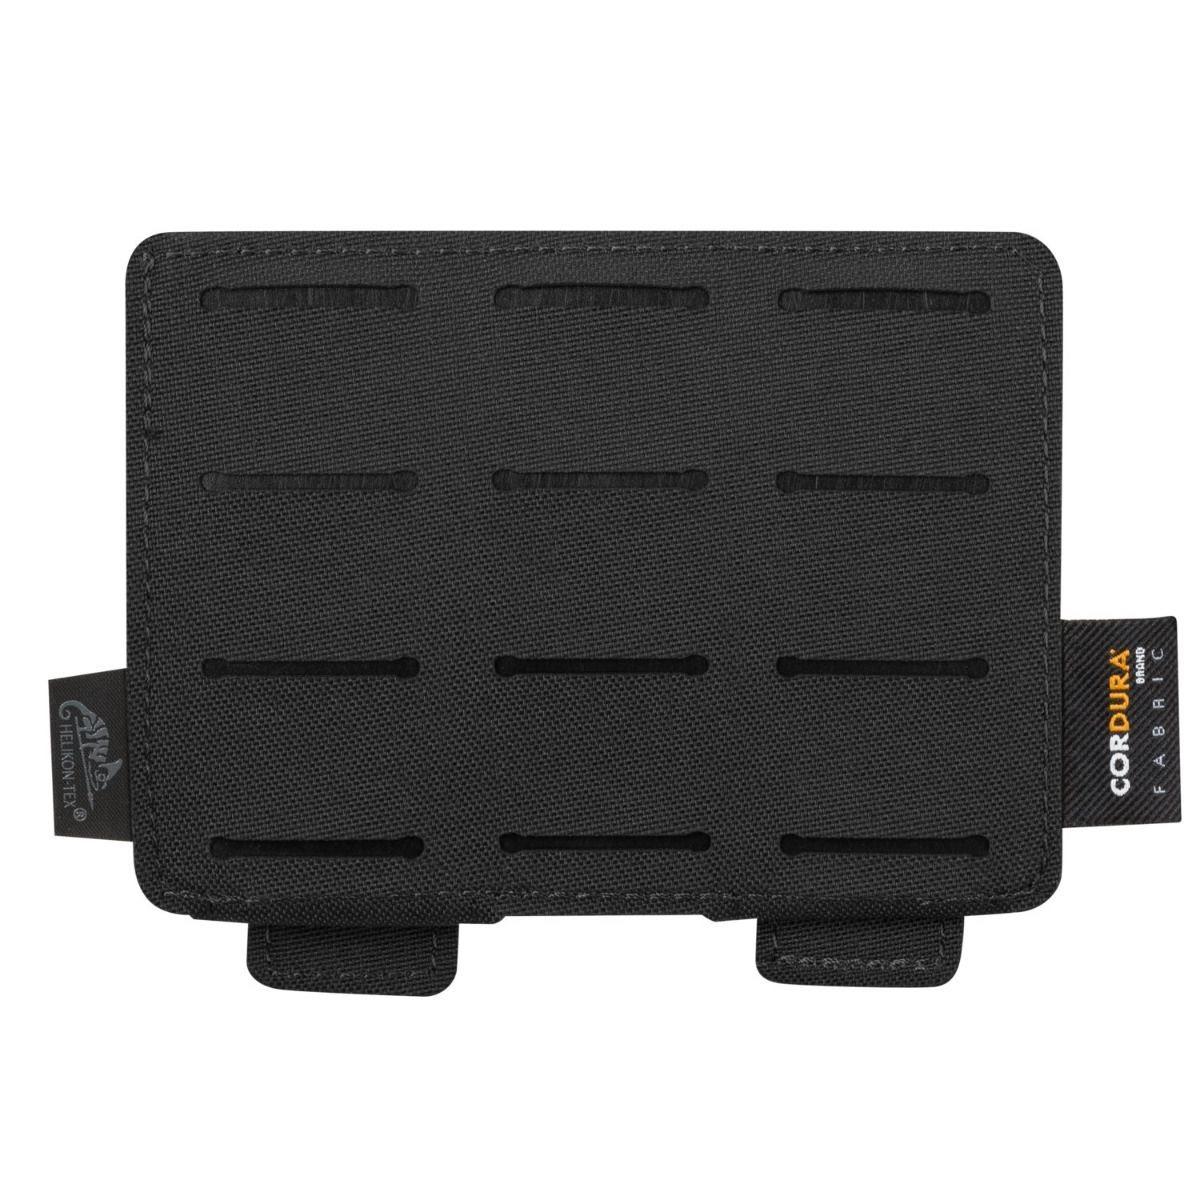 Panel opaskový MOLLE Adapter 3® Cordura® BLACK